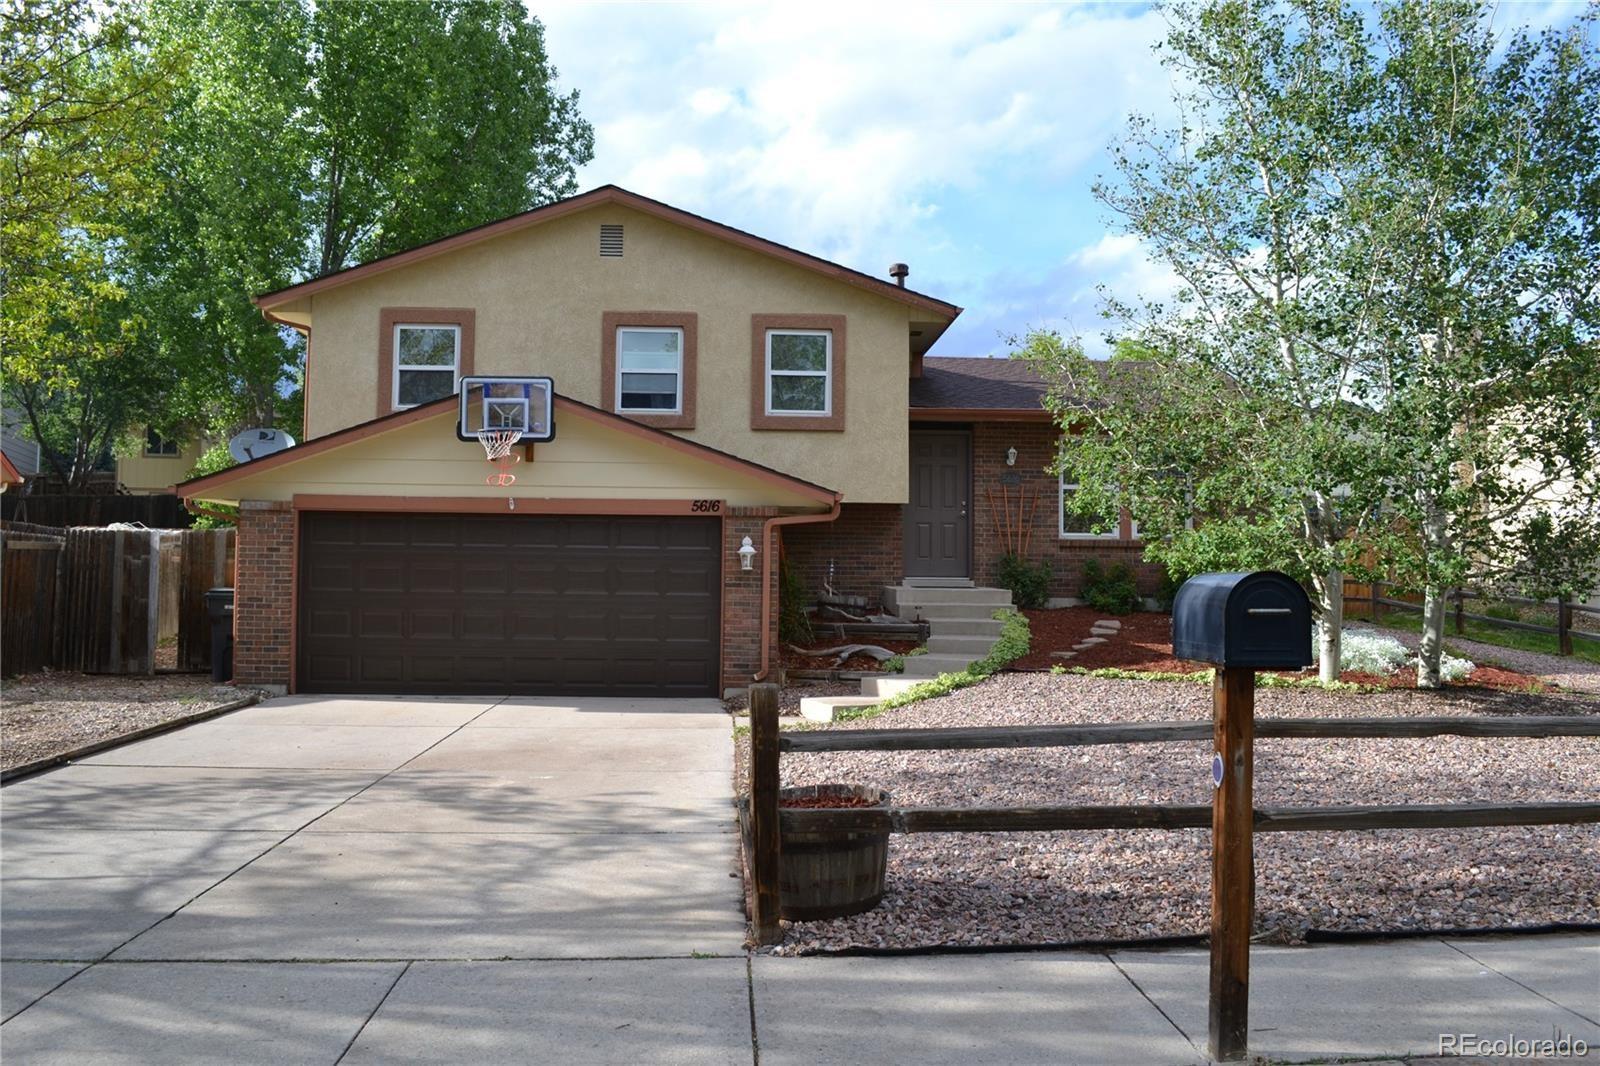 MLS# 4486712 - 1 - 5616 Trout Creek Pass Drive, Colorado Springs, CO 80917